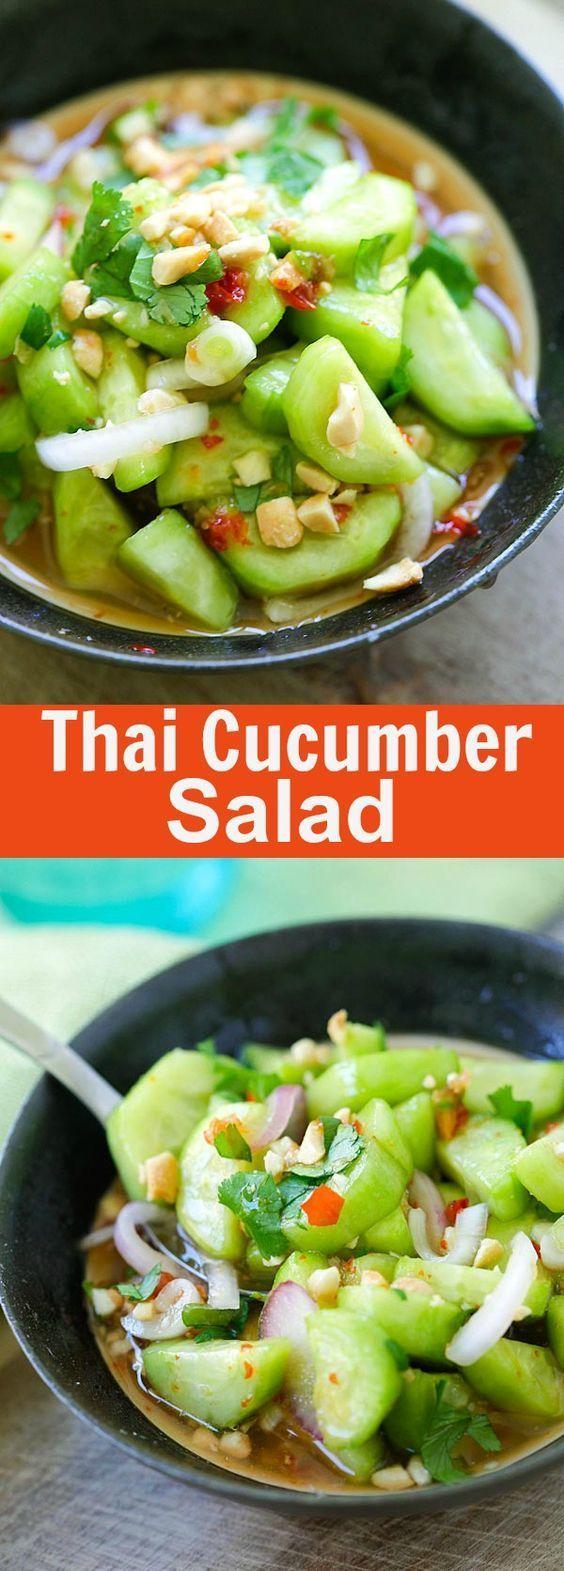 Thai Cucumber Salad - easiest and best homemade Thai cucumber salad recipe that is better than your favorite Thai restaurants, guaranteed   rasamalaysia.com